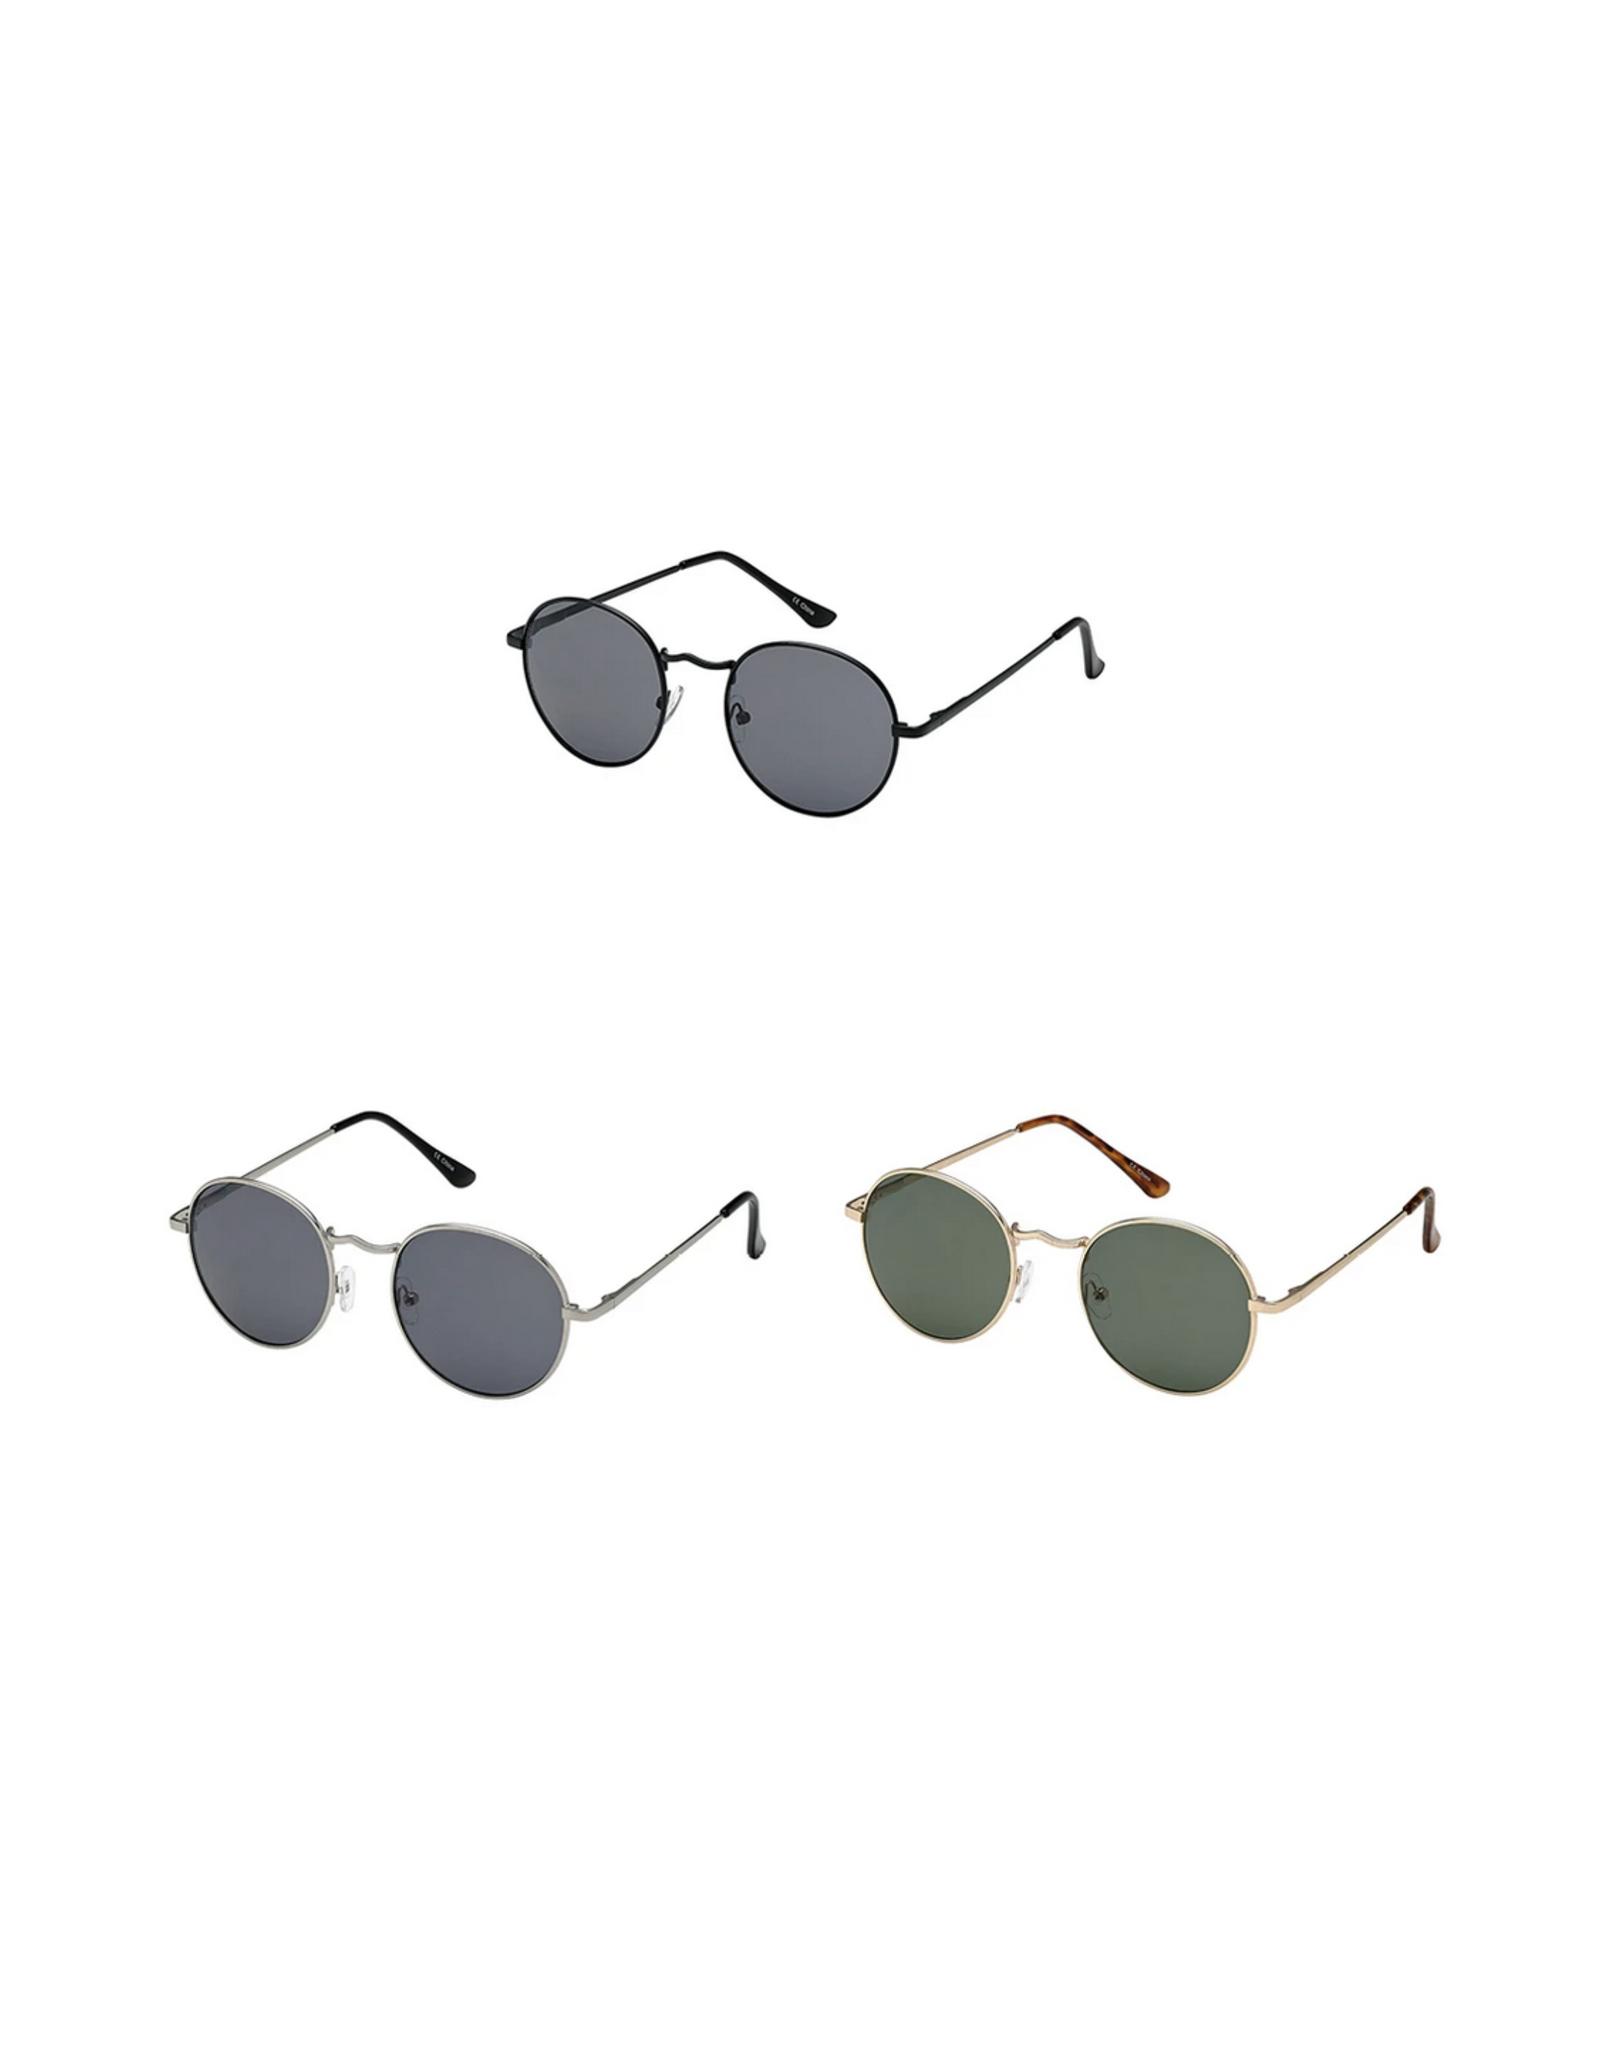 Heritage Sunglasses (3 colors!)